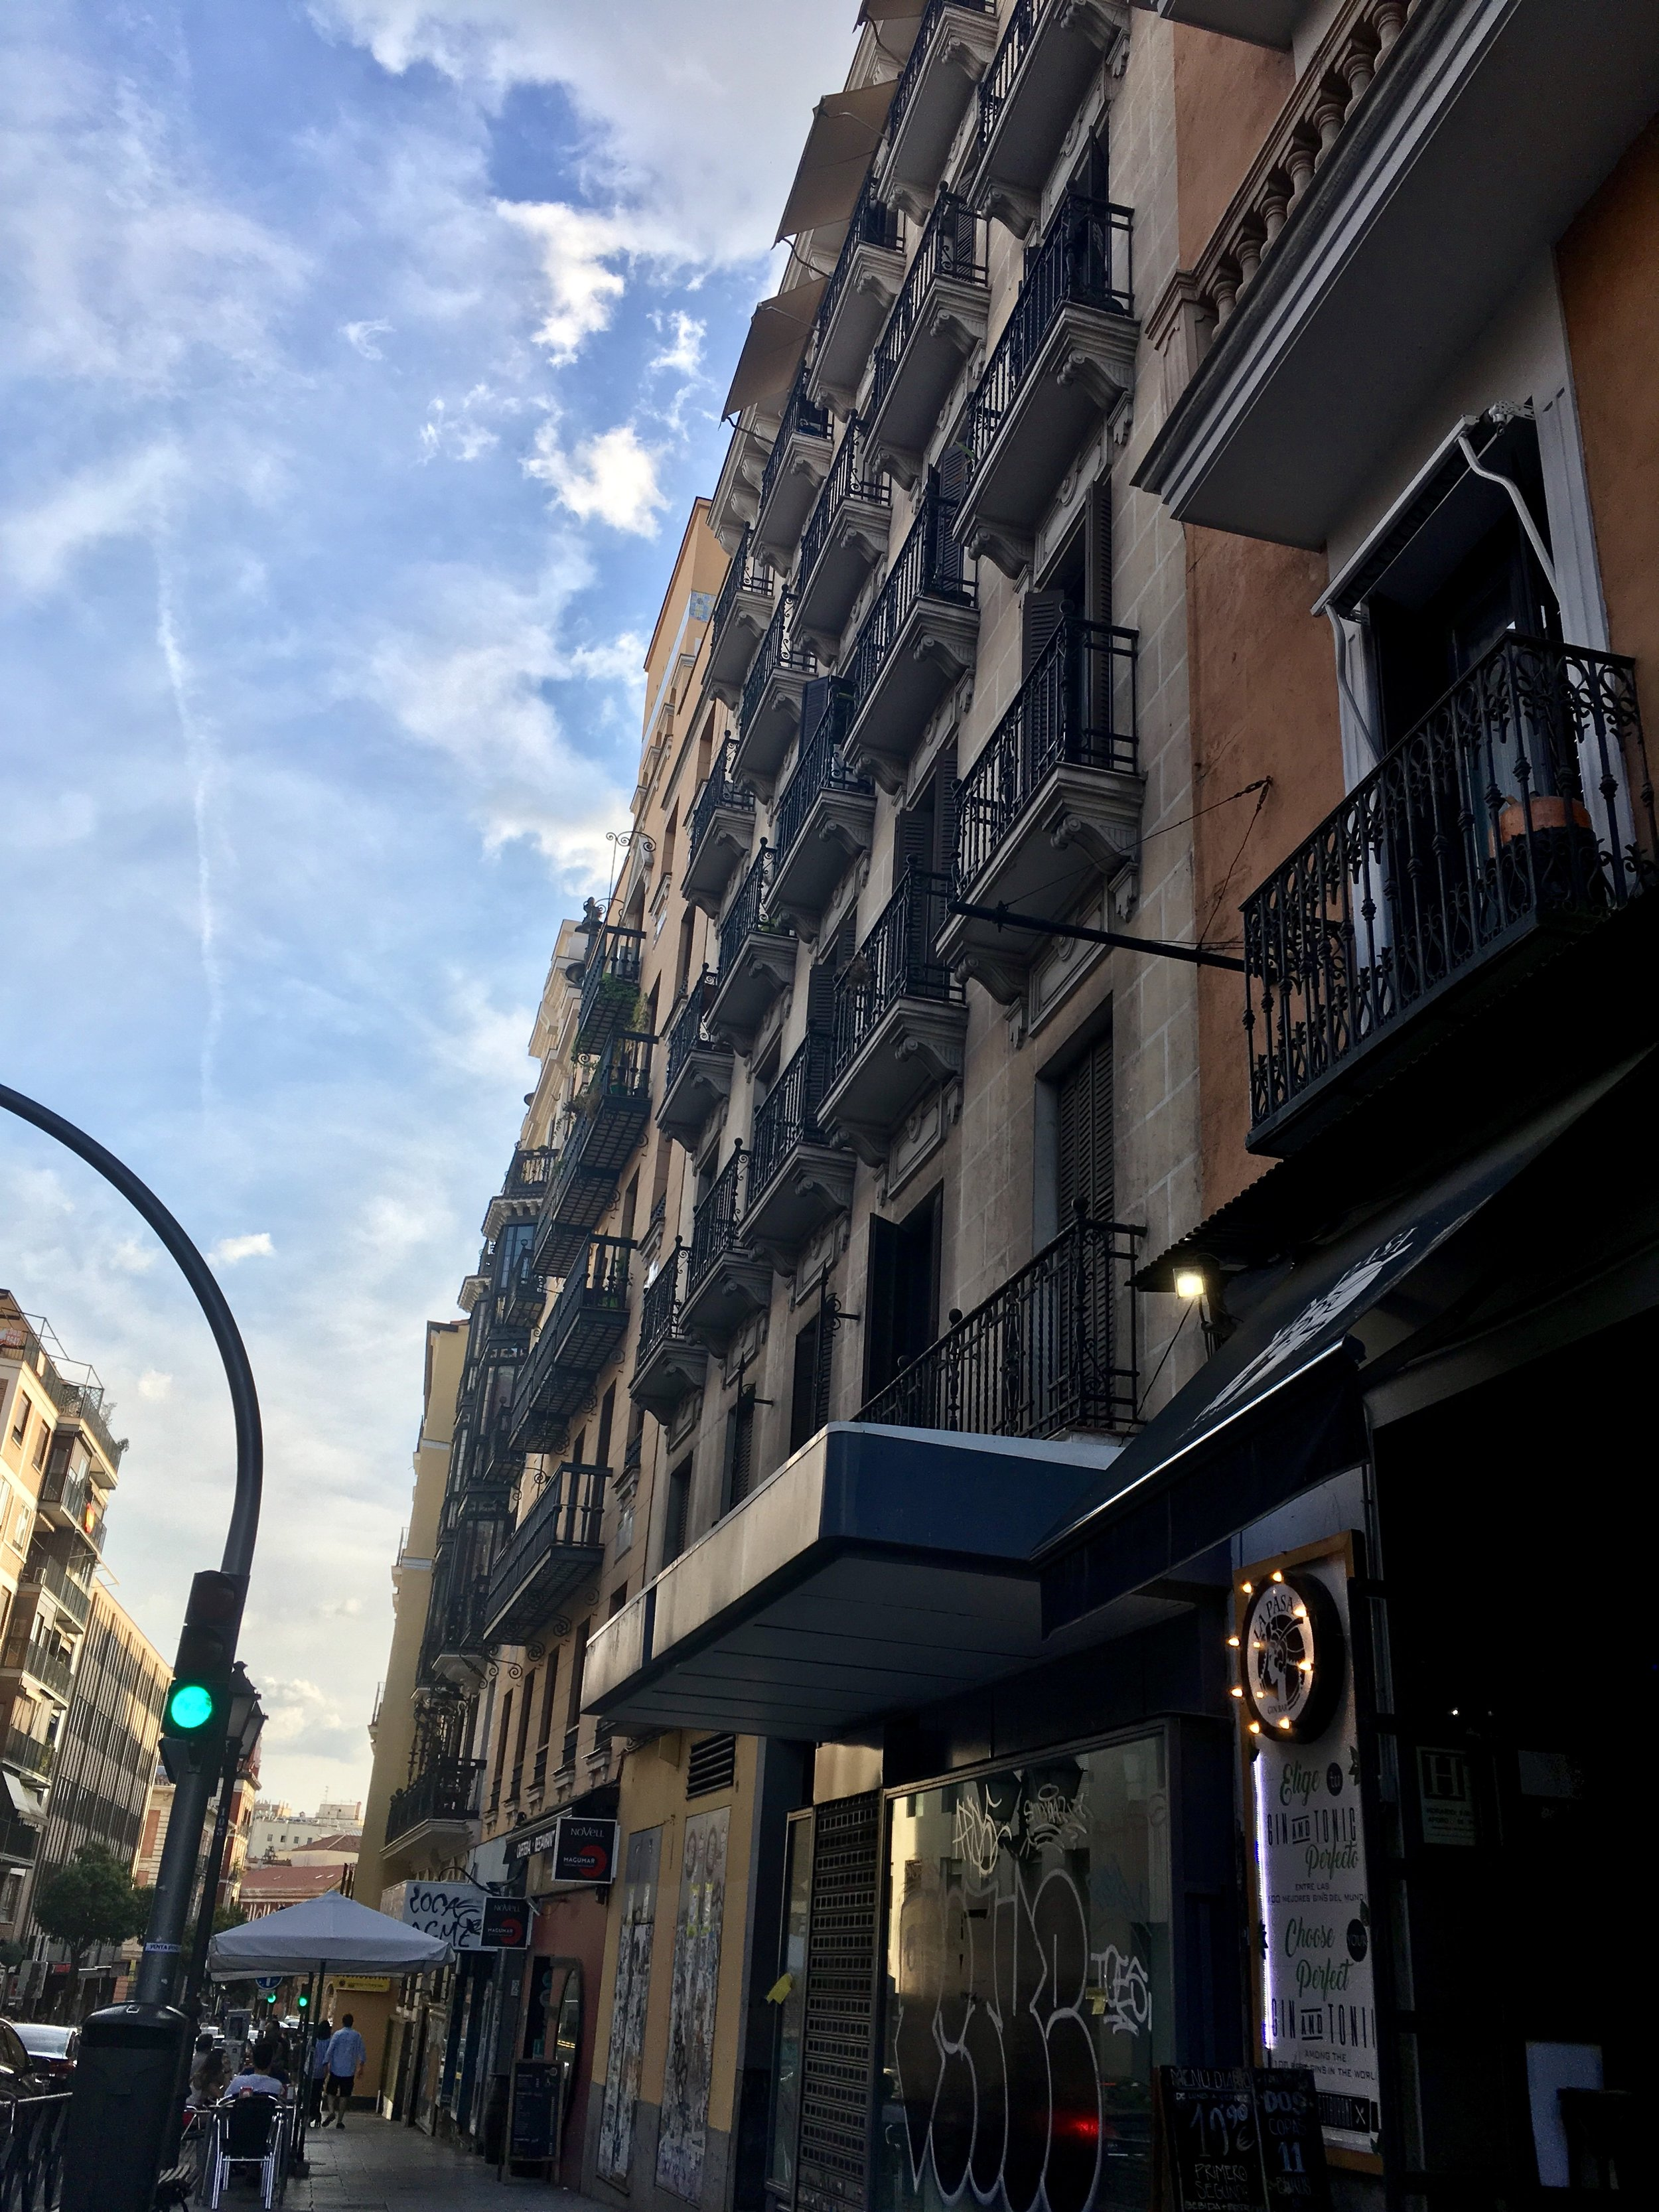 Street in Malasaña, in front of La Pasa Gin Bar!